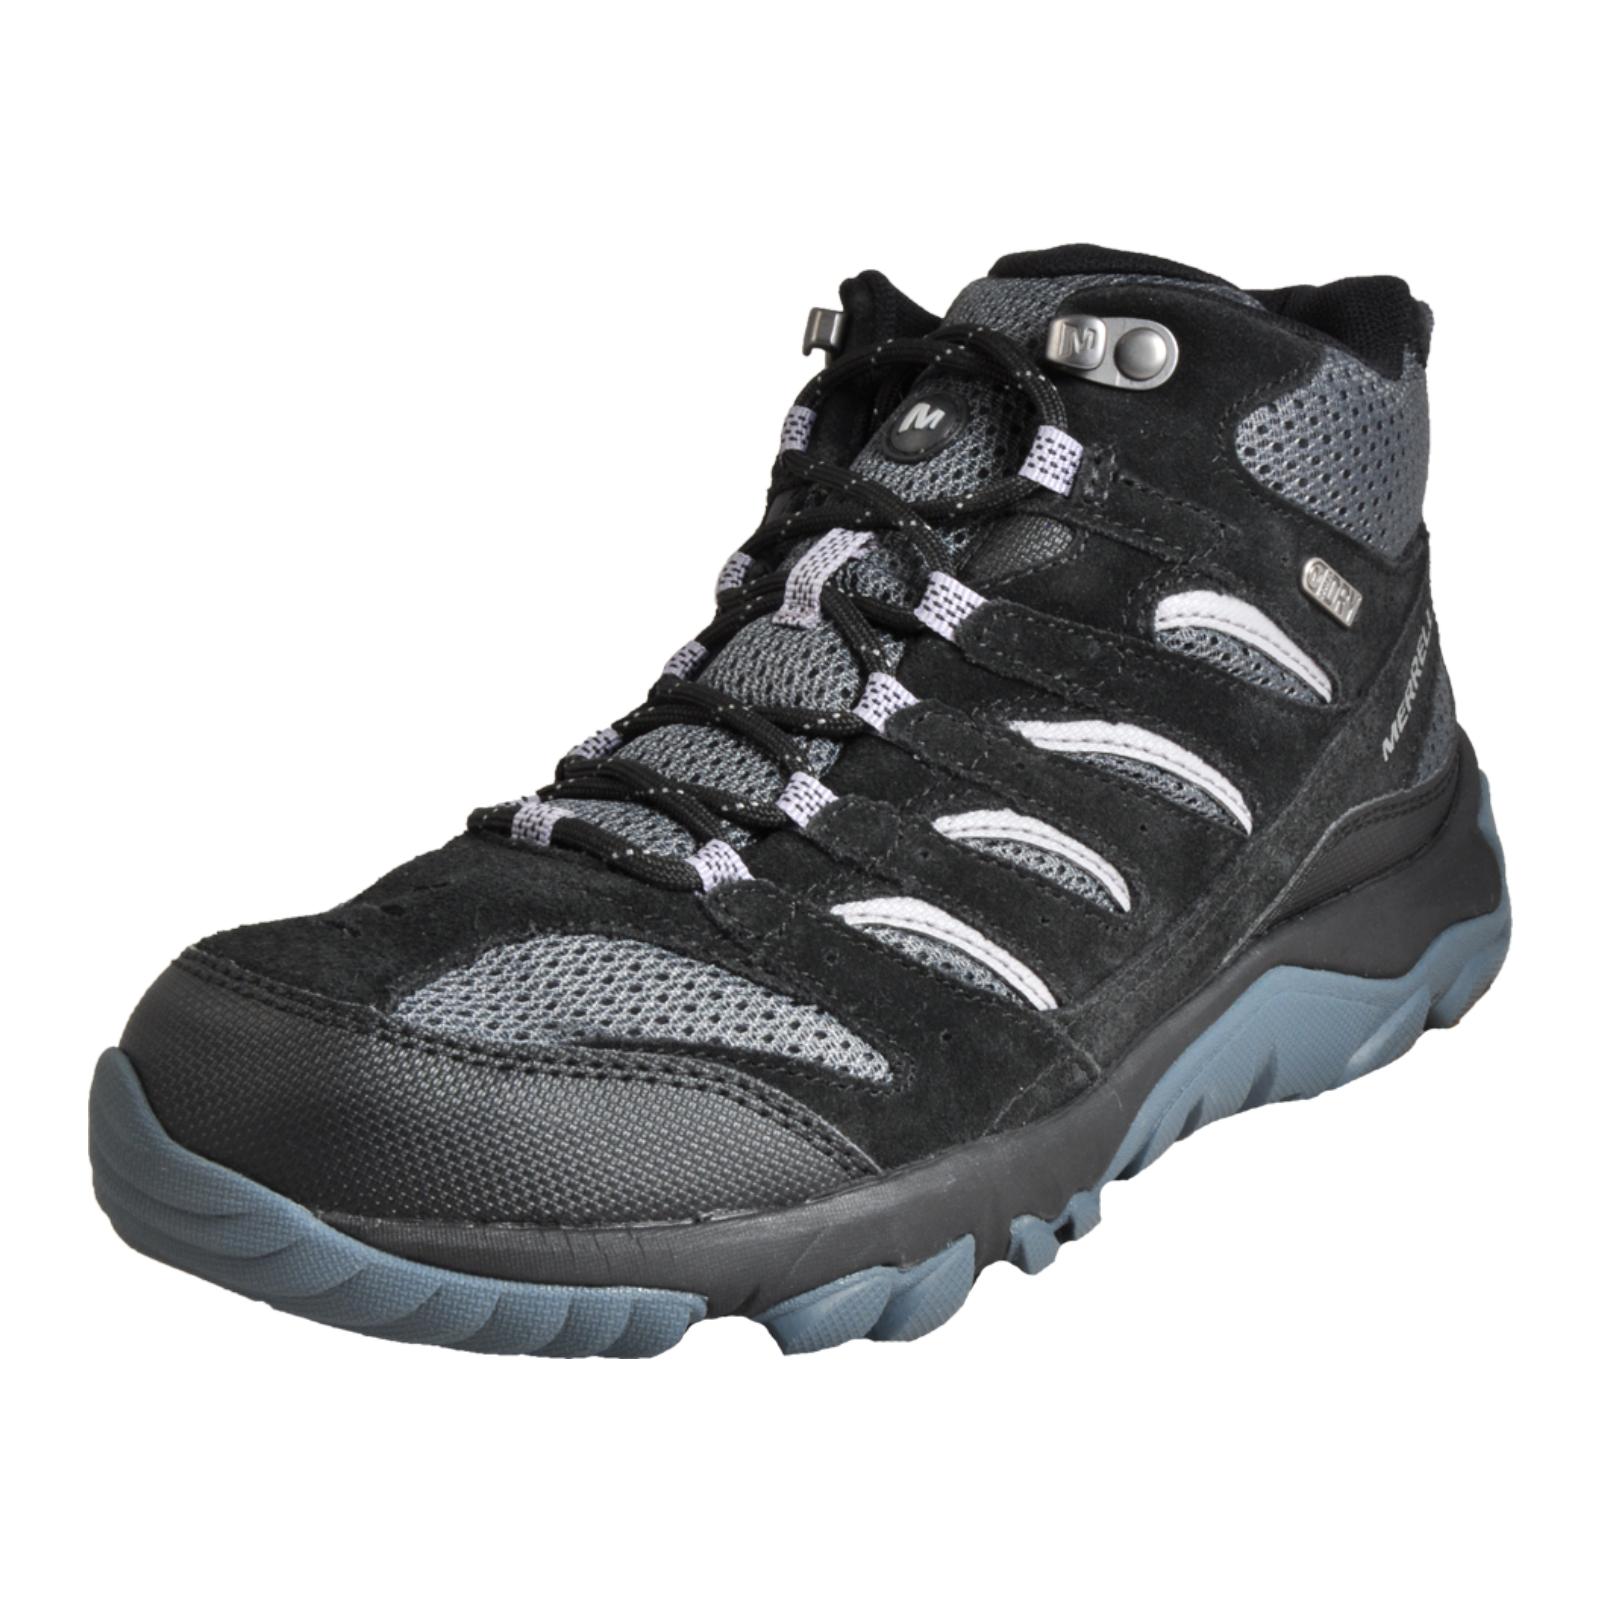 53a07a5279d618 Merrell White Pine Mid Ventilator Waterproof Men s Outdoor Hiking Boots  Black